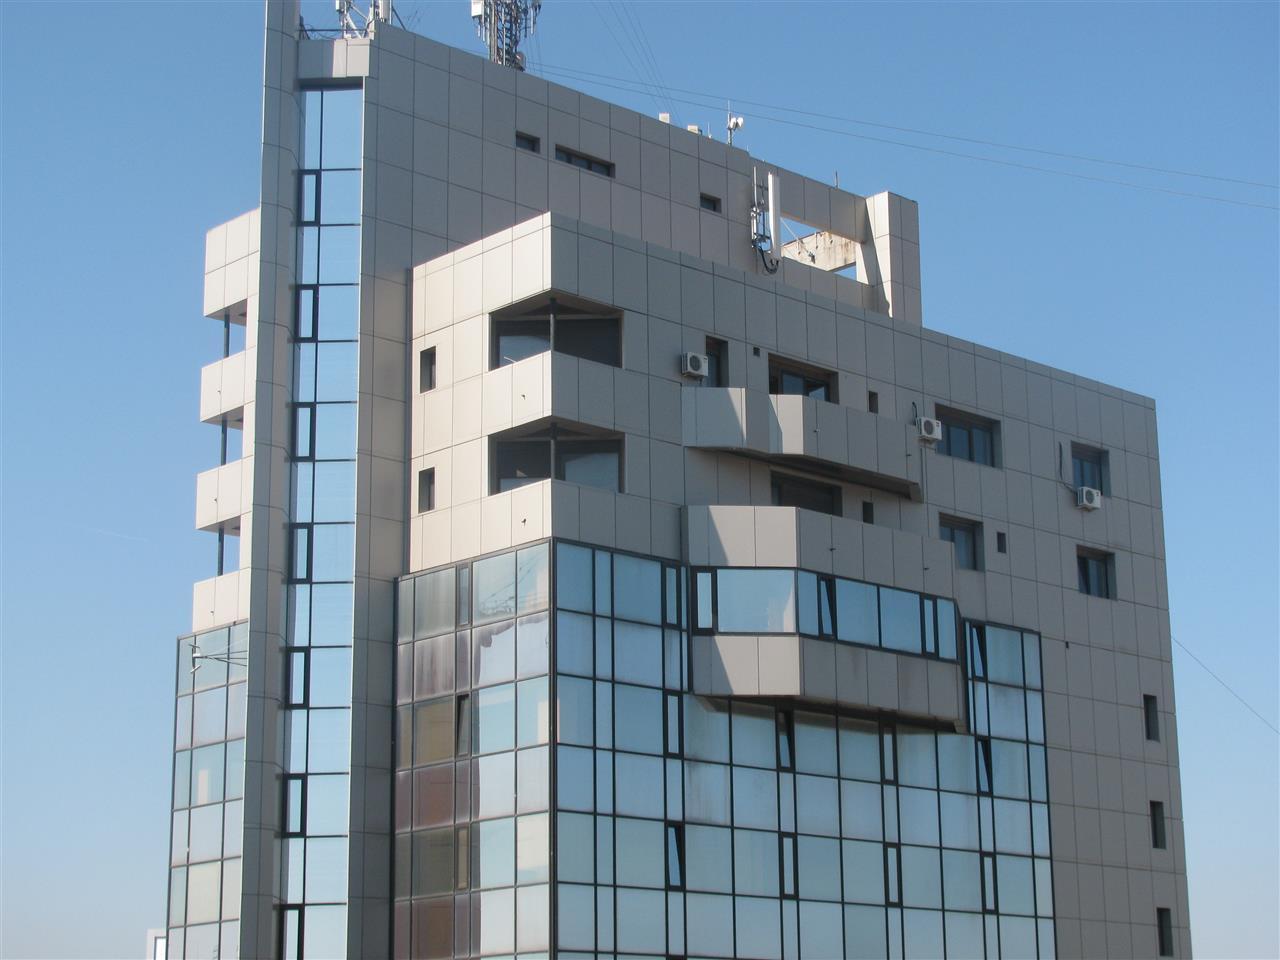 Inchiriere birouri langa metrou Aurel Vlaicu de la 350 mp